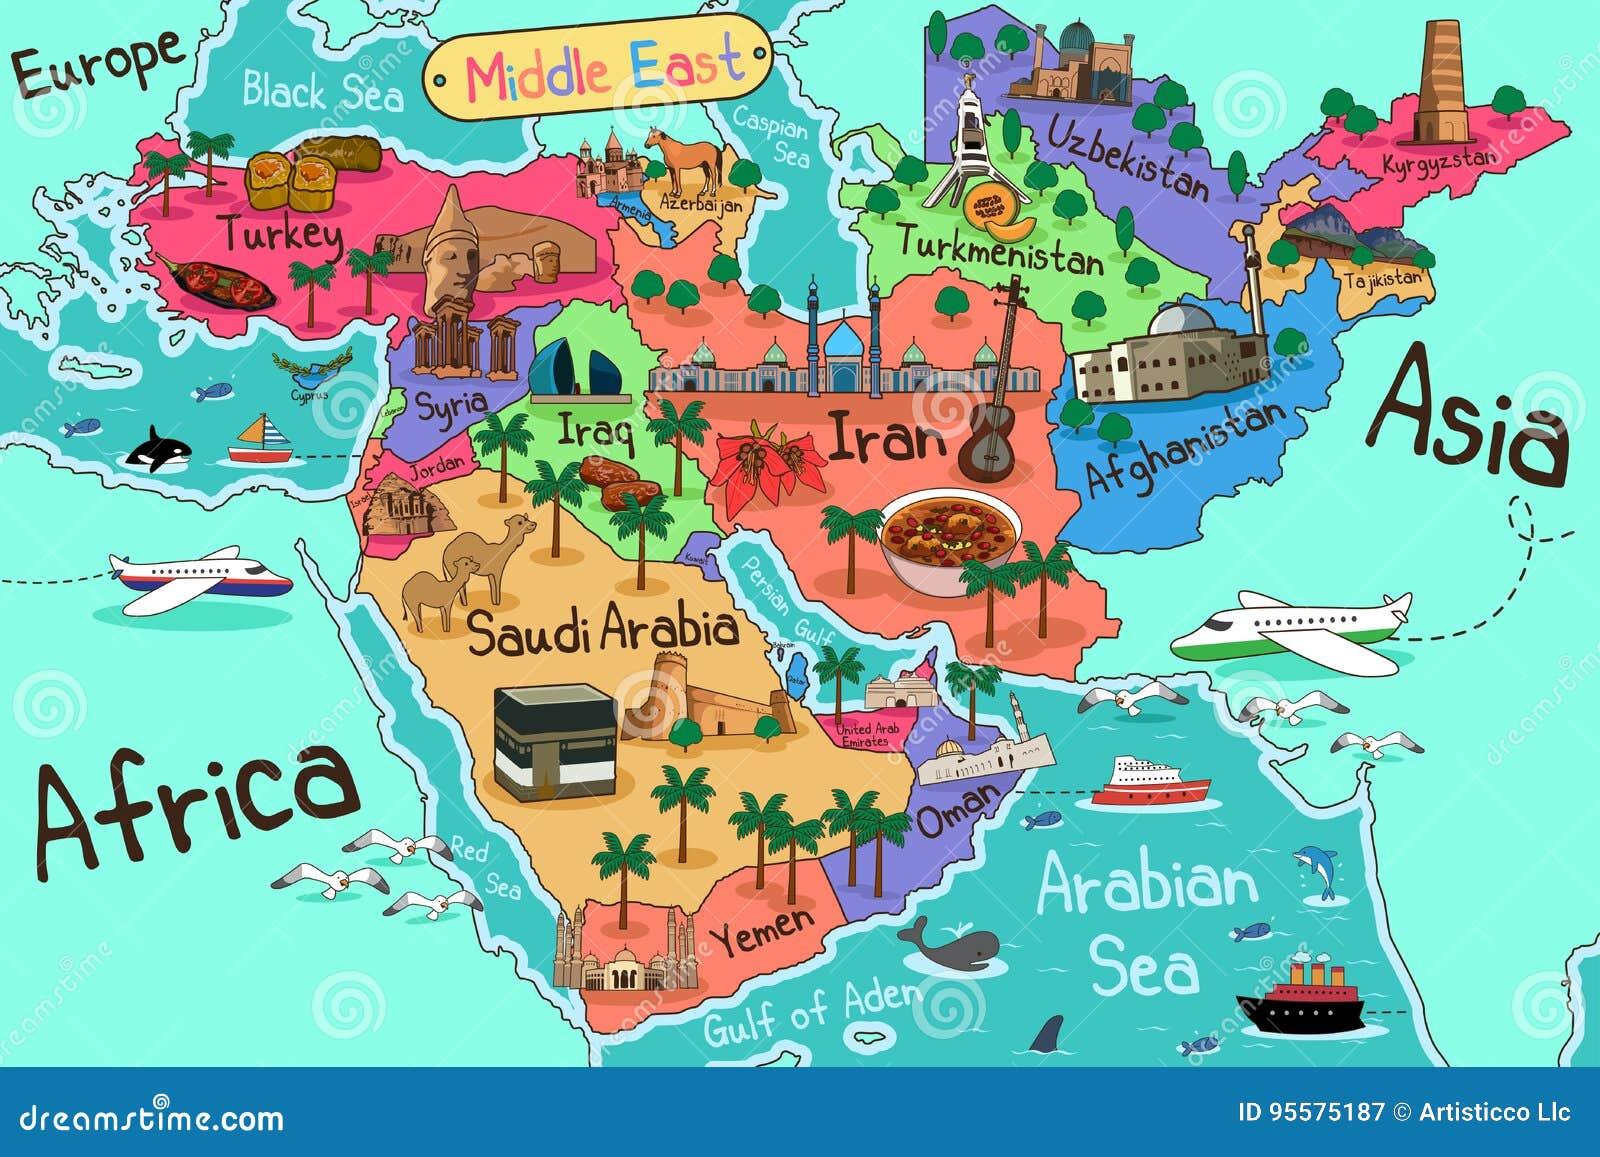 mapa dos países de médio oriente no estilo dos desenhos animados